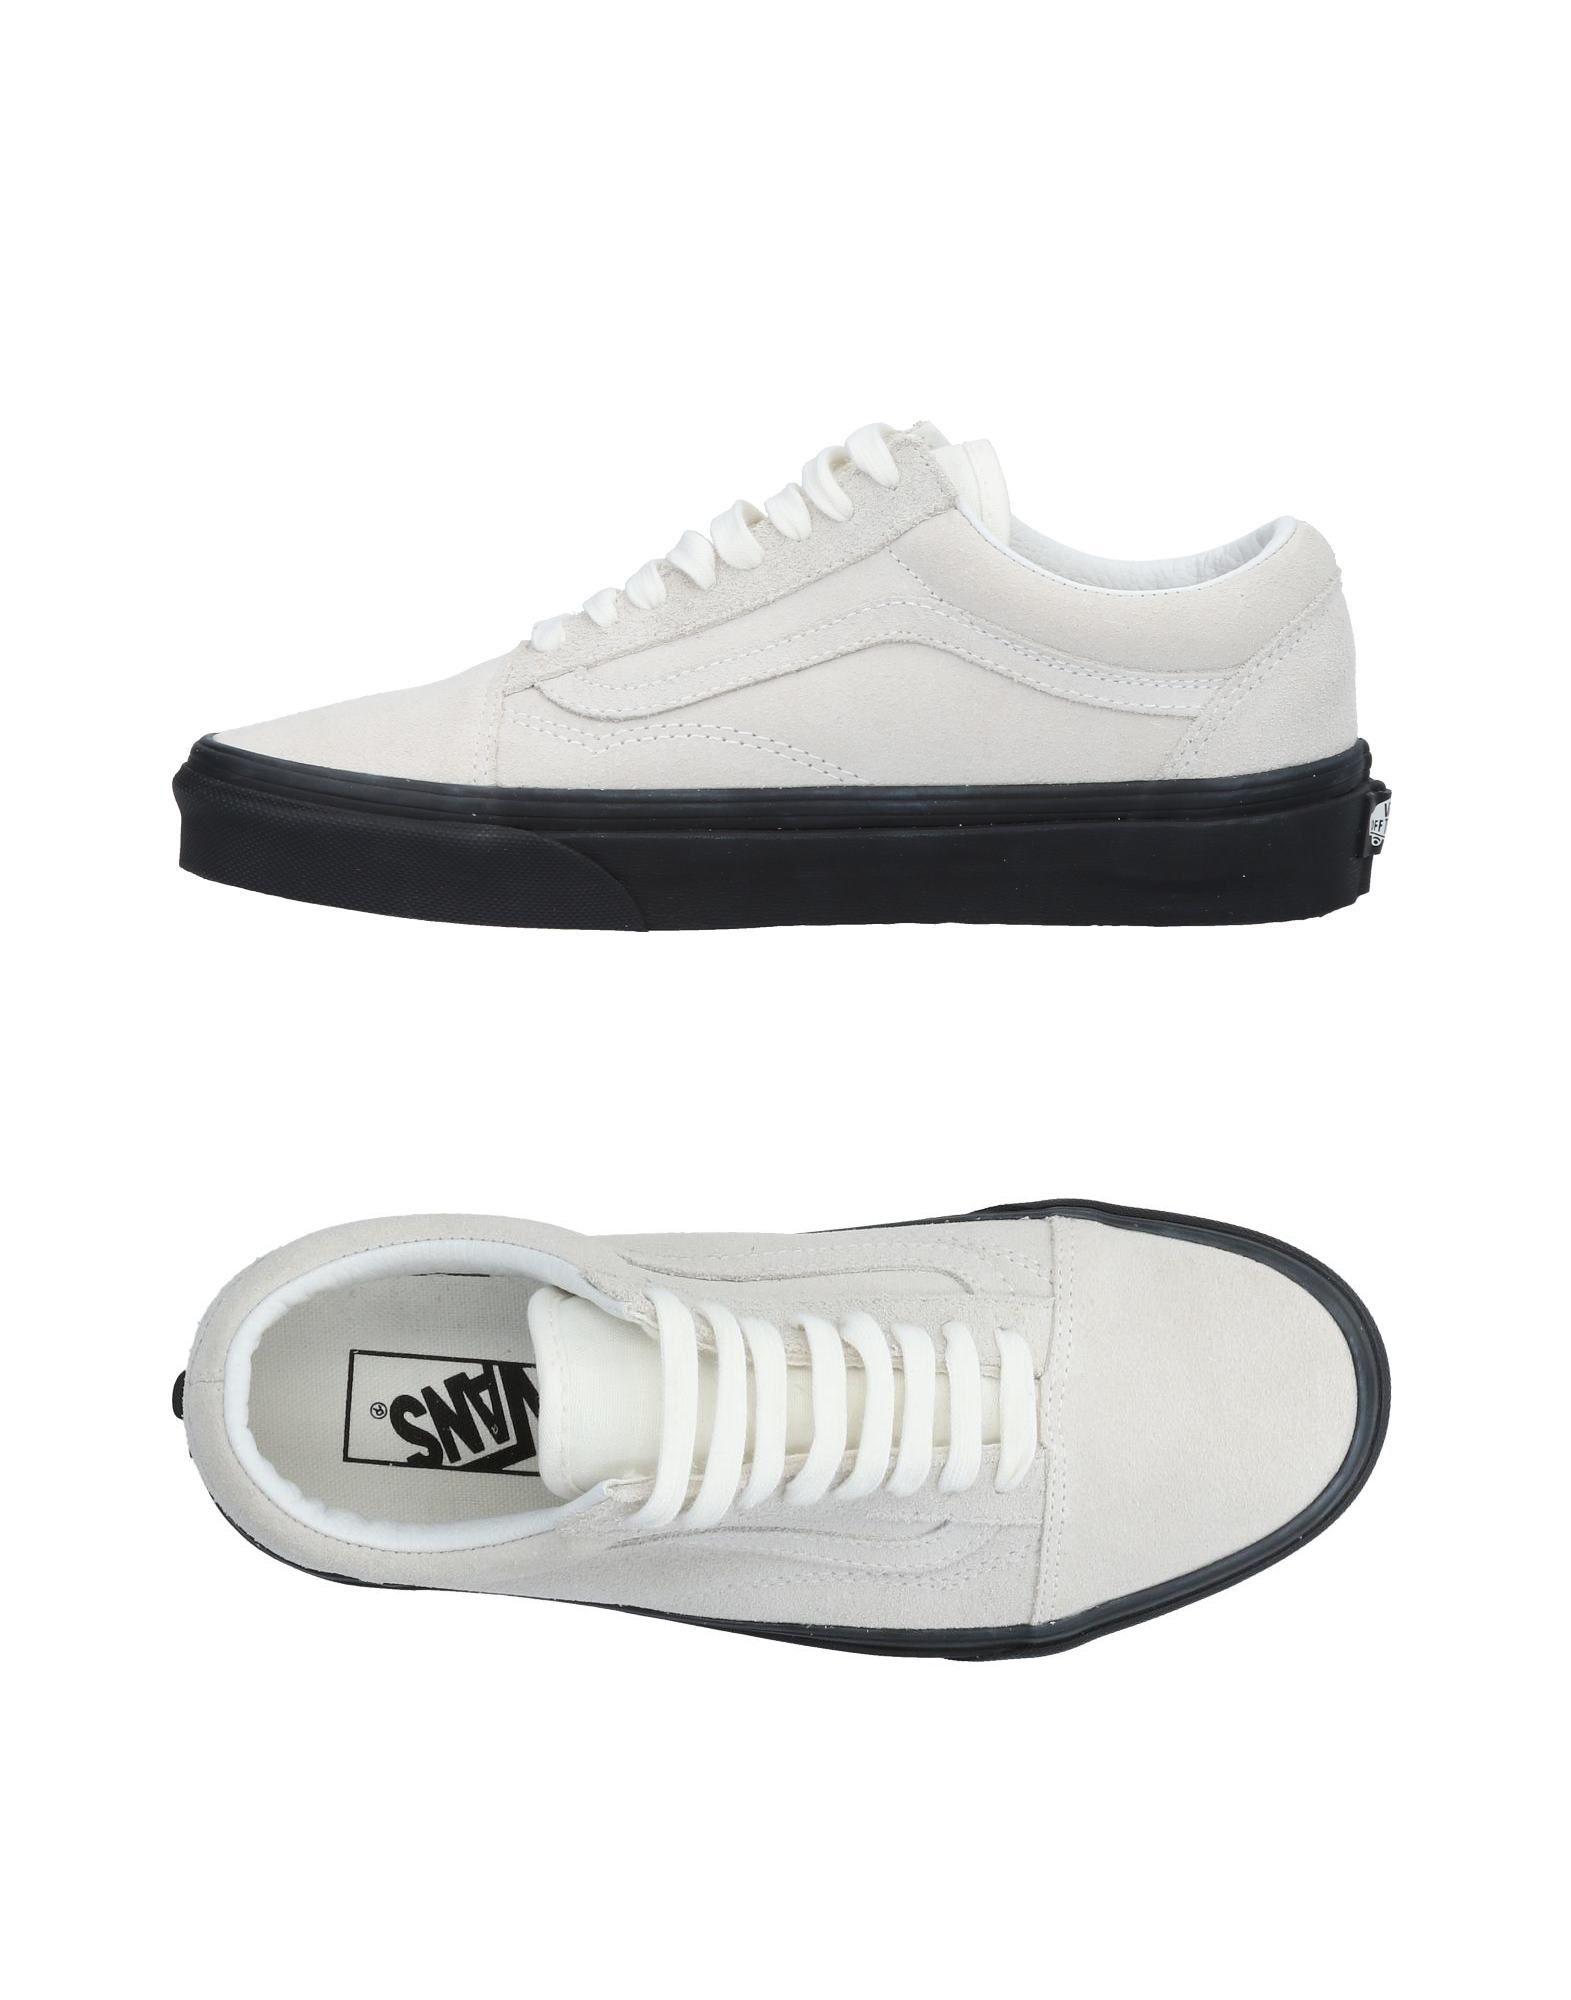 Sneakers Scarpe Vans Donna - 11492308BT Scarpe Sneakers comode e distintive 4bf2f9